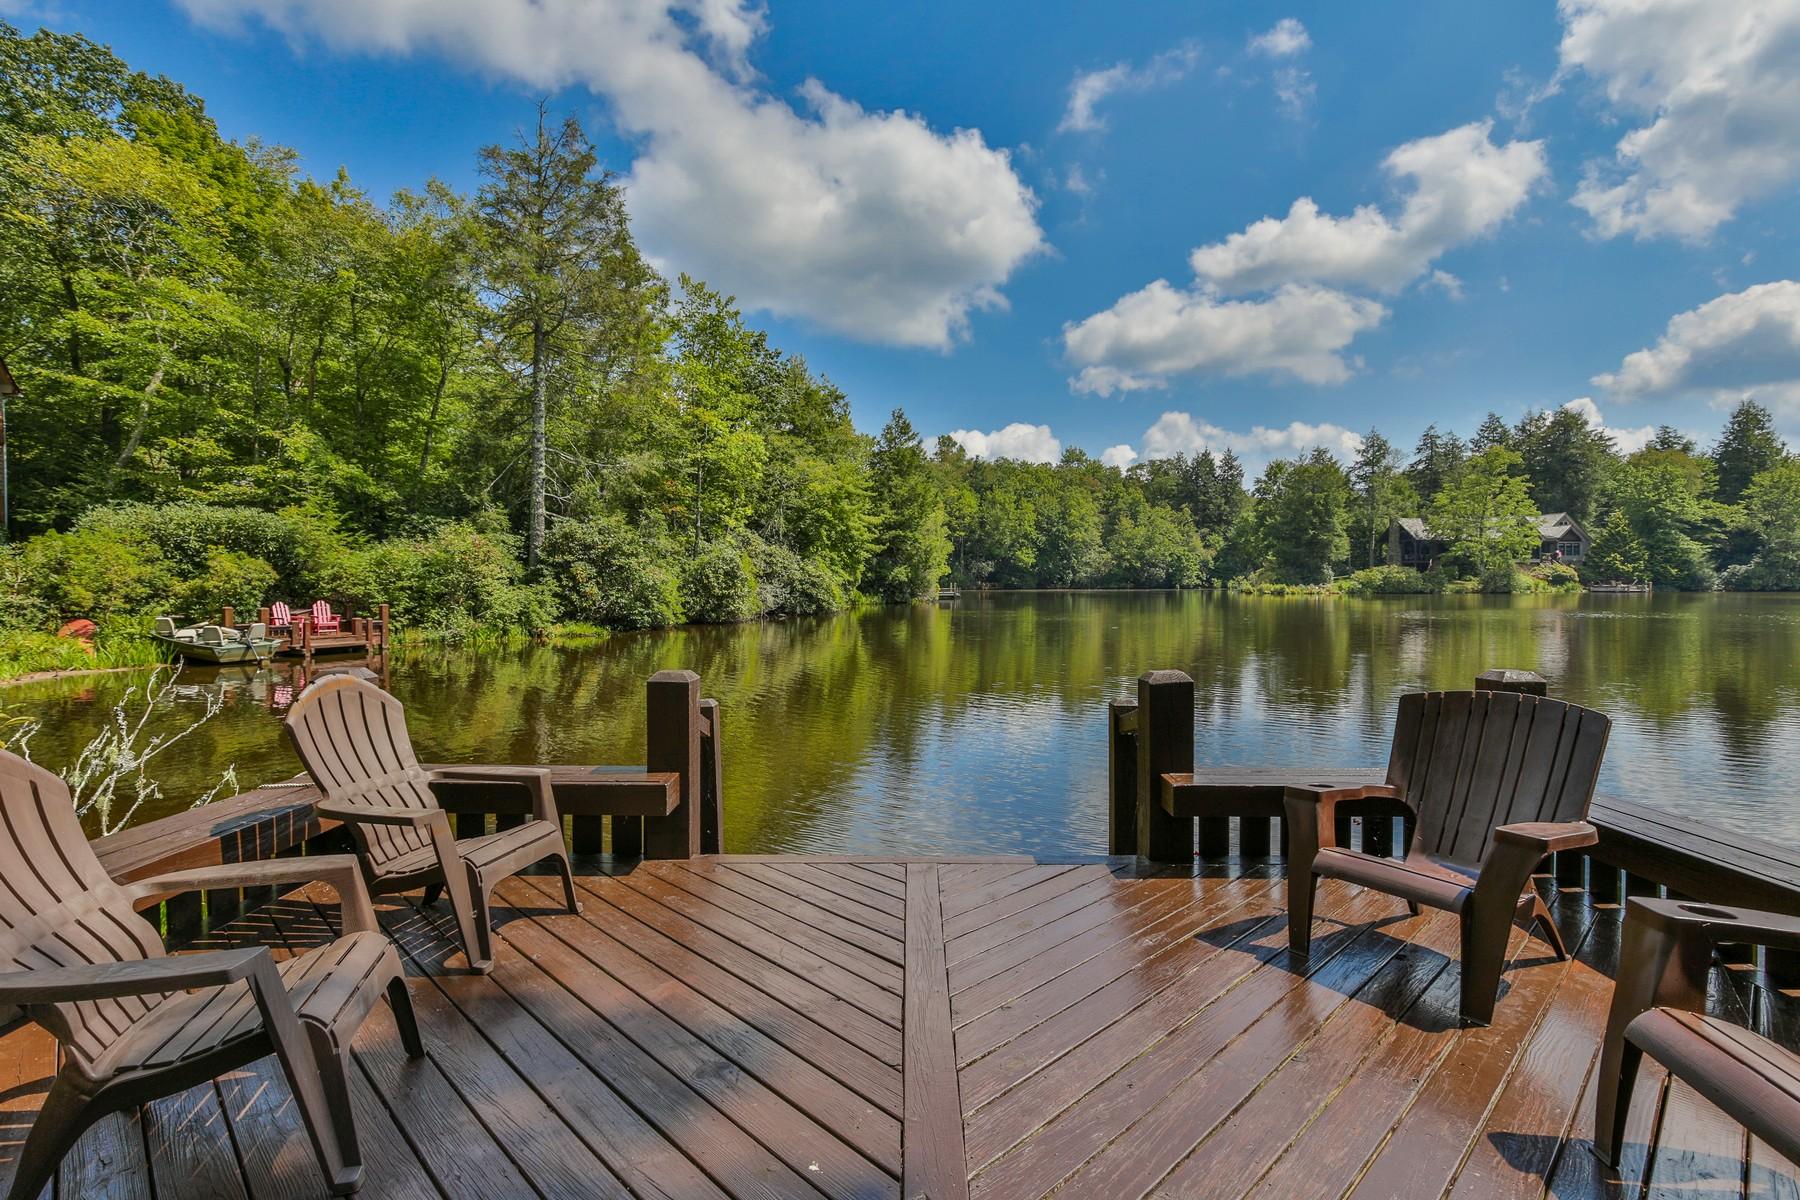 Single Family Homes for Sale at 95 Cullasaja Club Drive Highlands, North Carolina 28741 United States